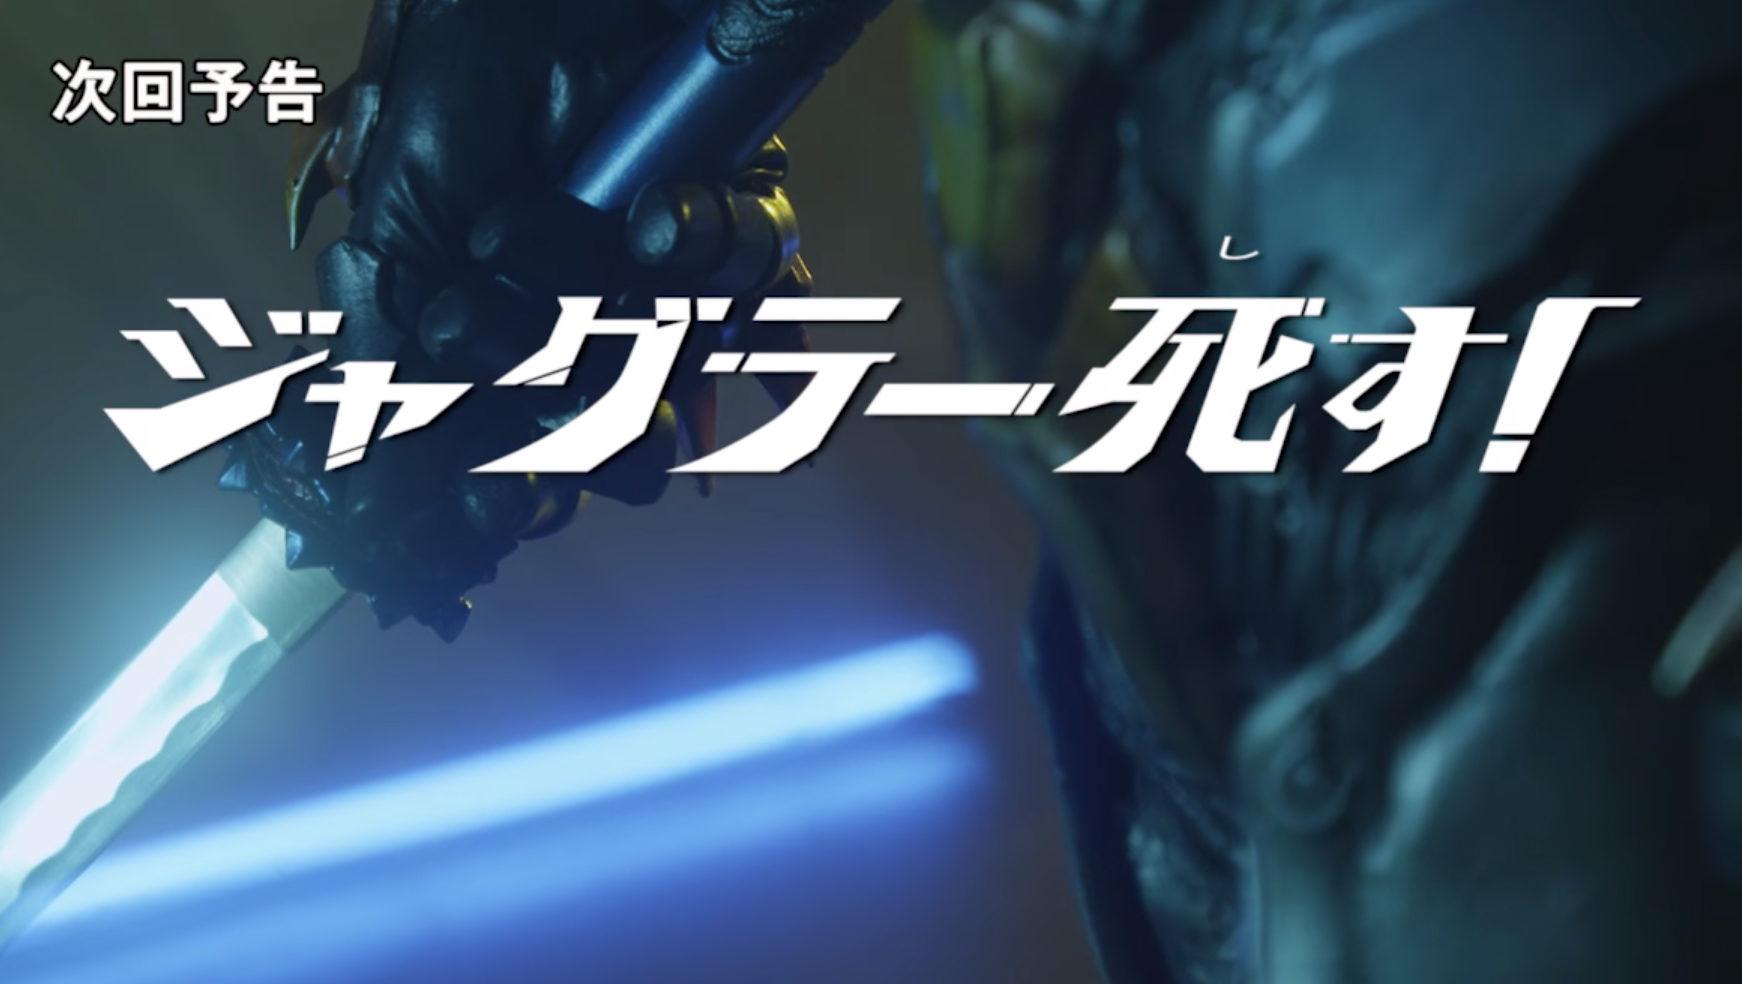 Next Time On Ultraman Orb: Episode 10